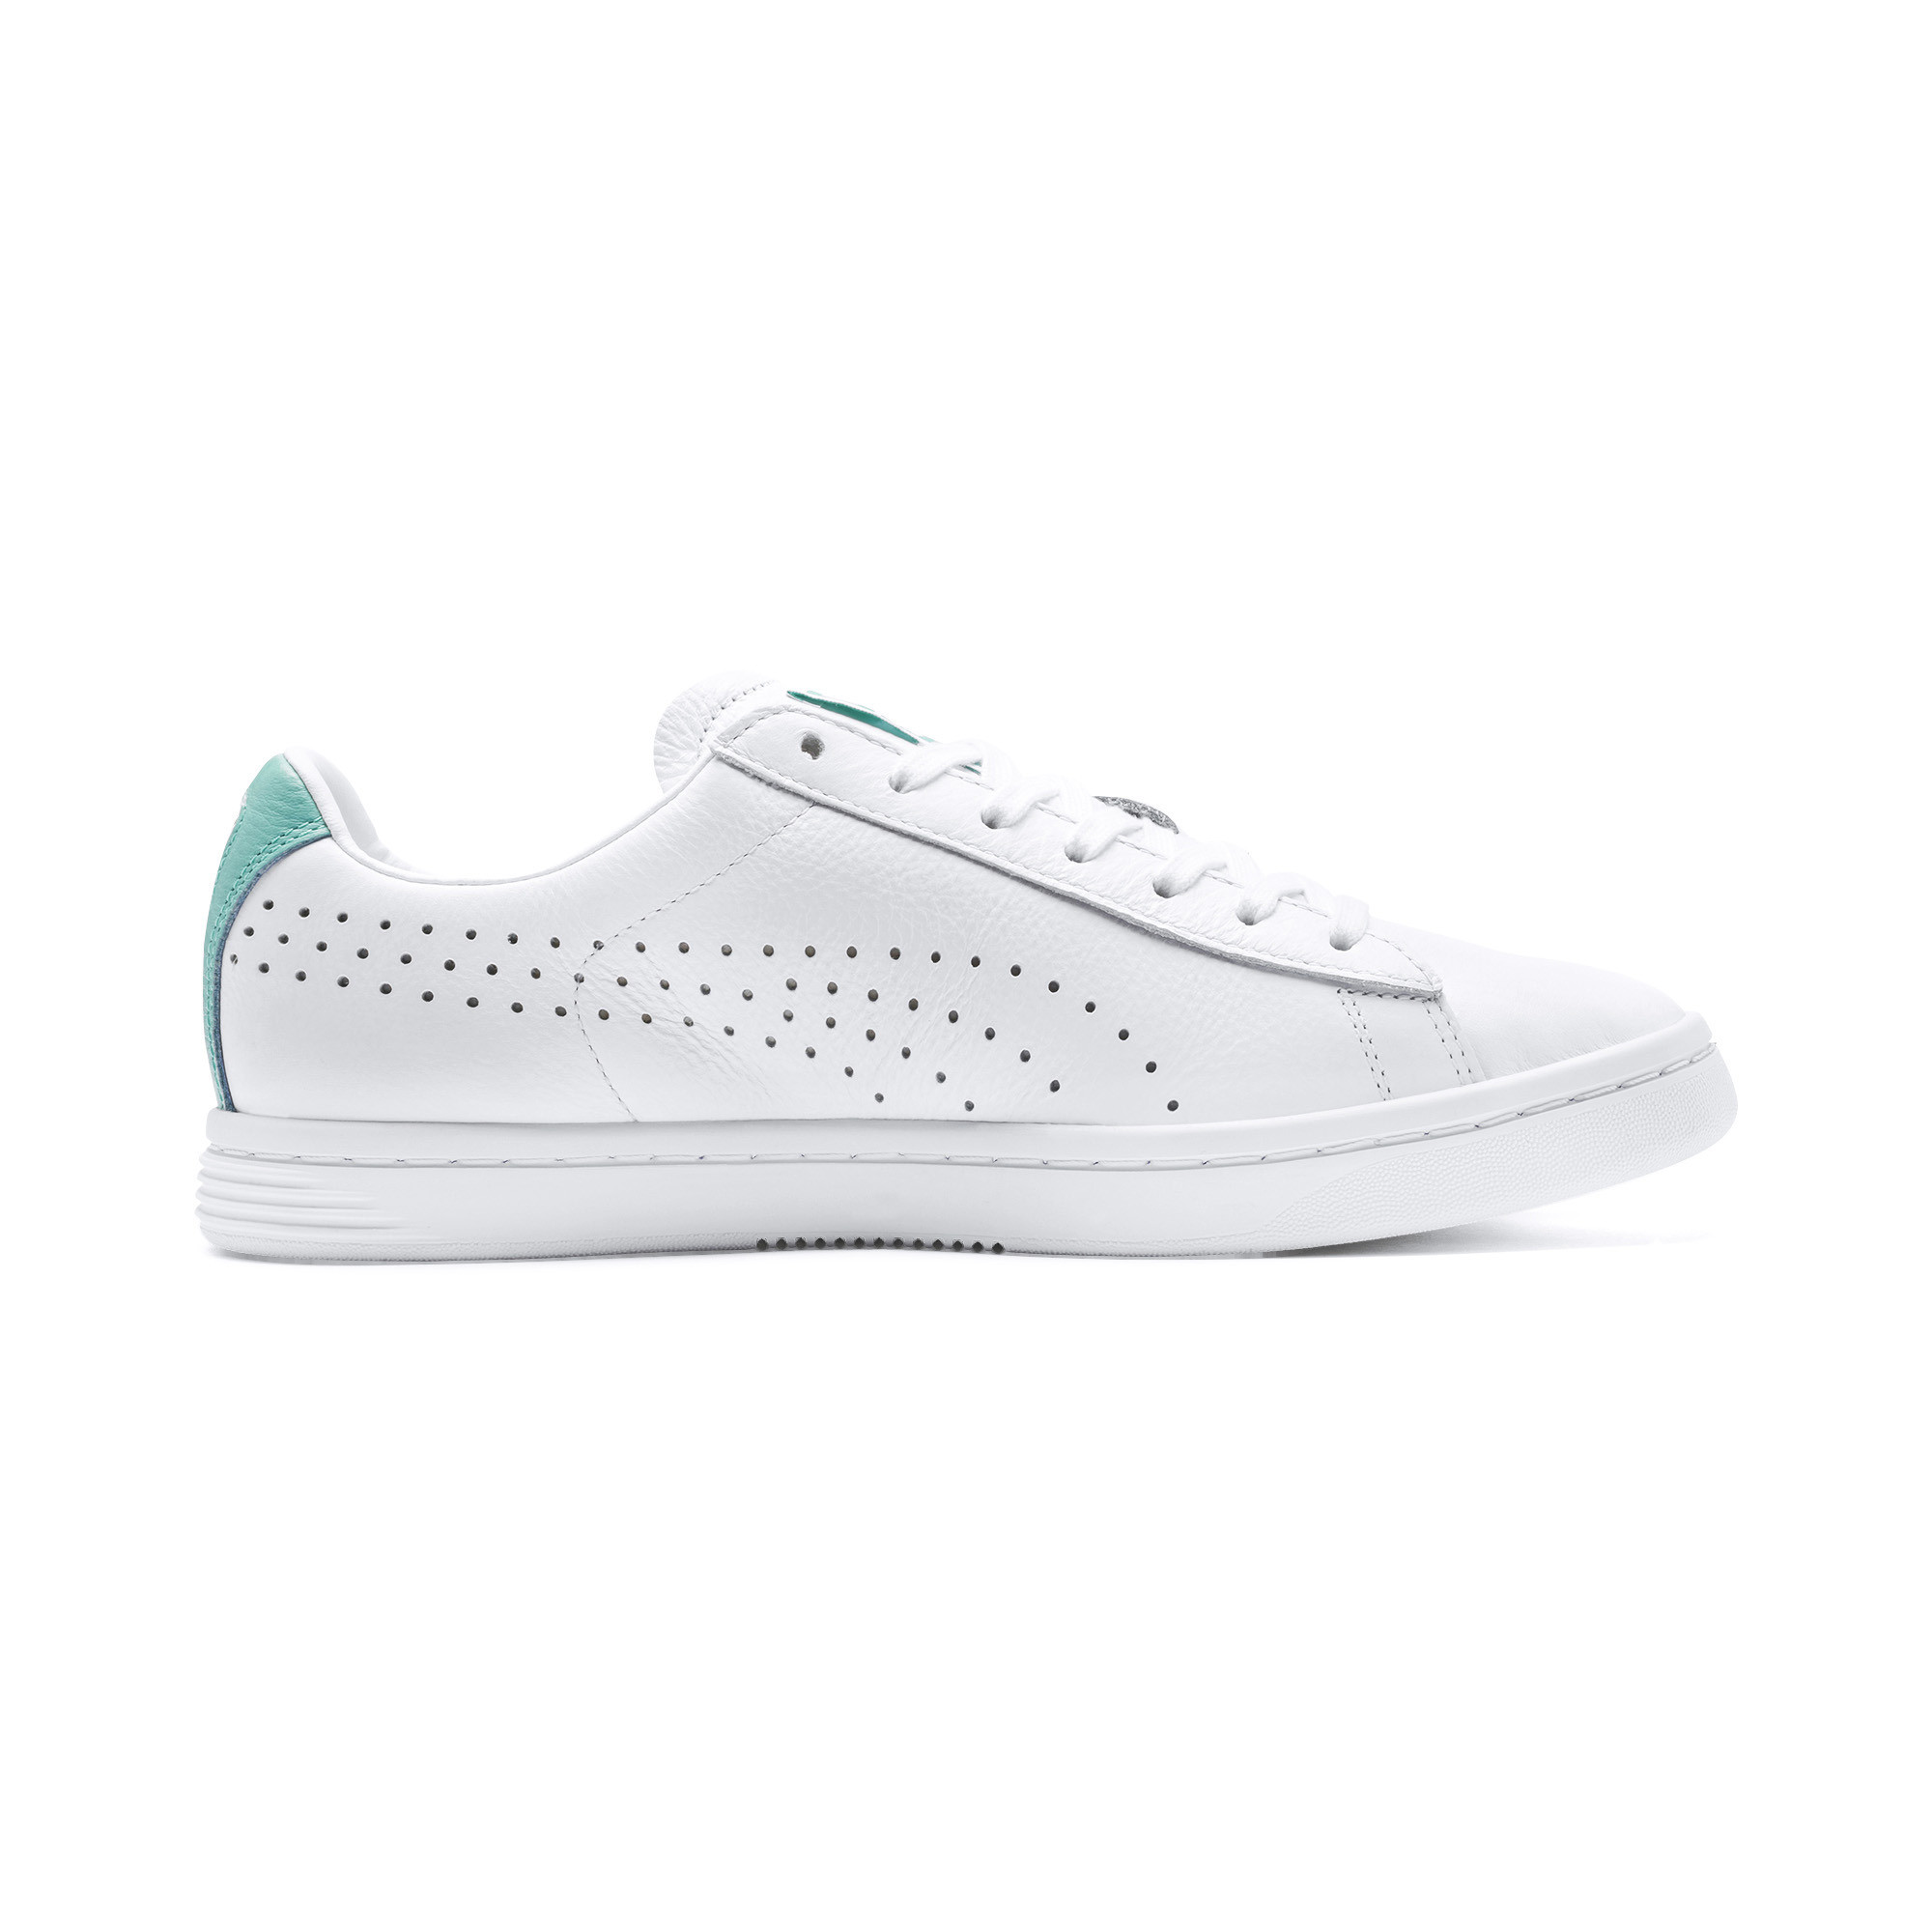 PUMA-Court-Star-Men-039-s-Sneakers-Unisex-Shoe-Sport-Classics thumbnail 7